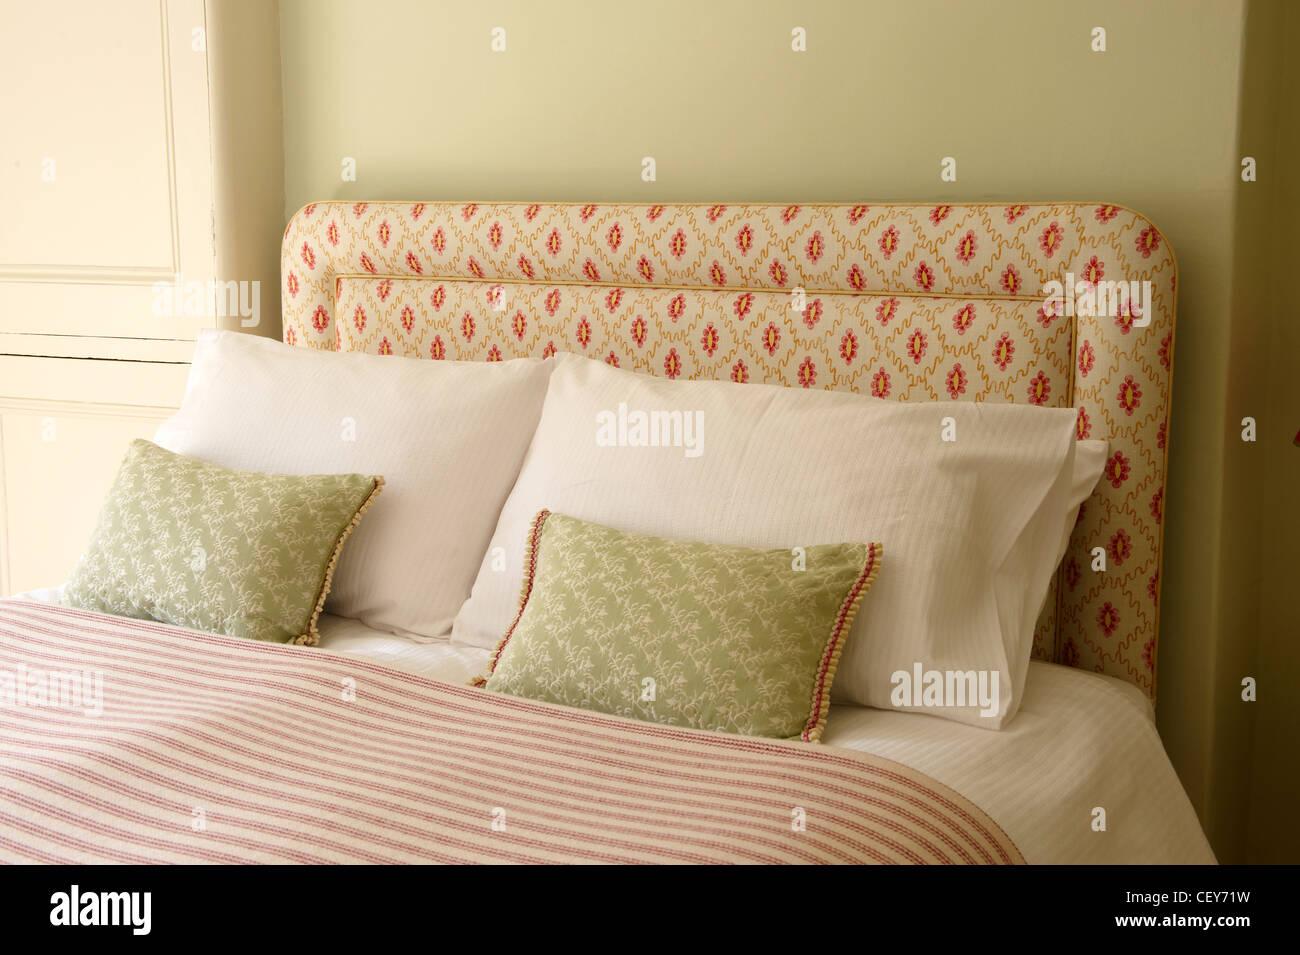 Victorian Home Interior Stockfotos & Victorian Home Interior Bilder ...